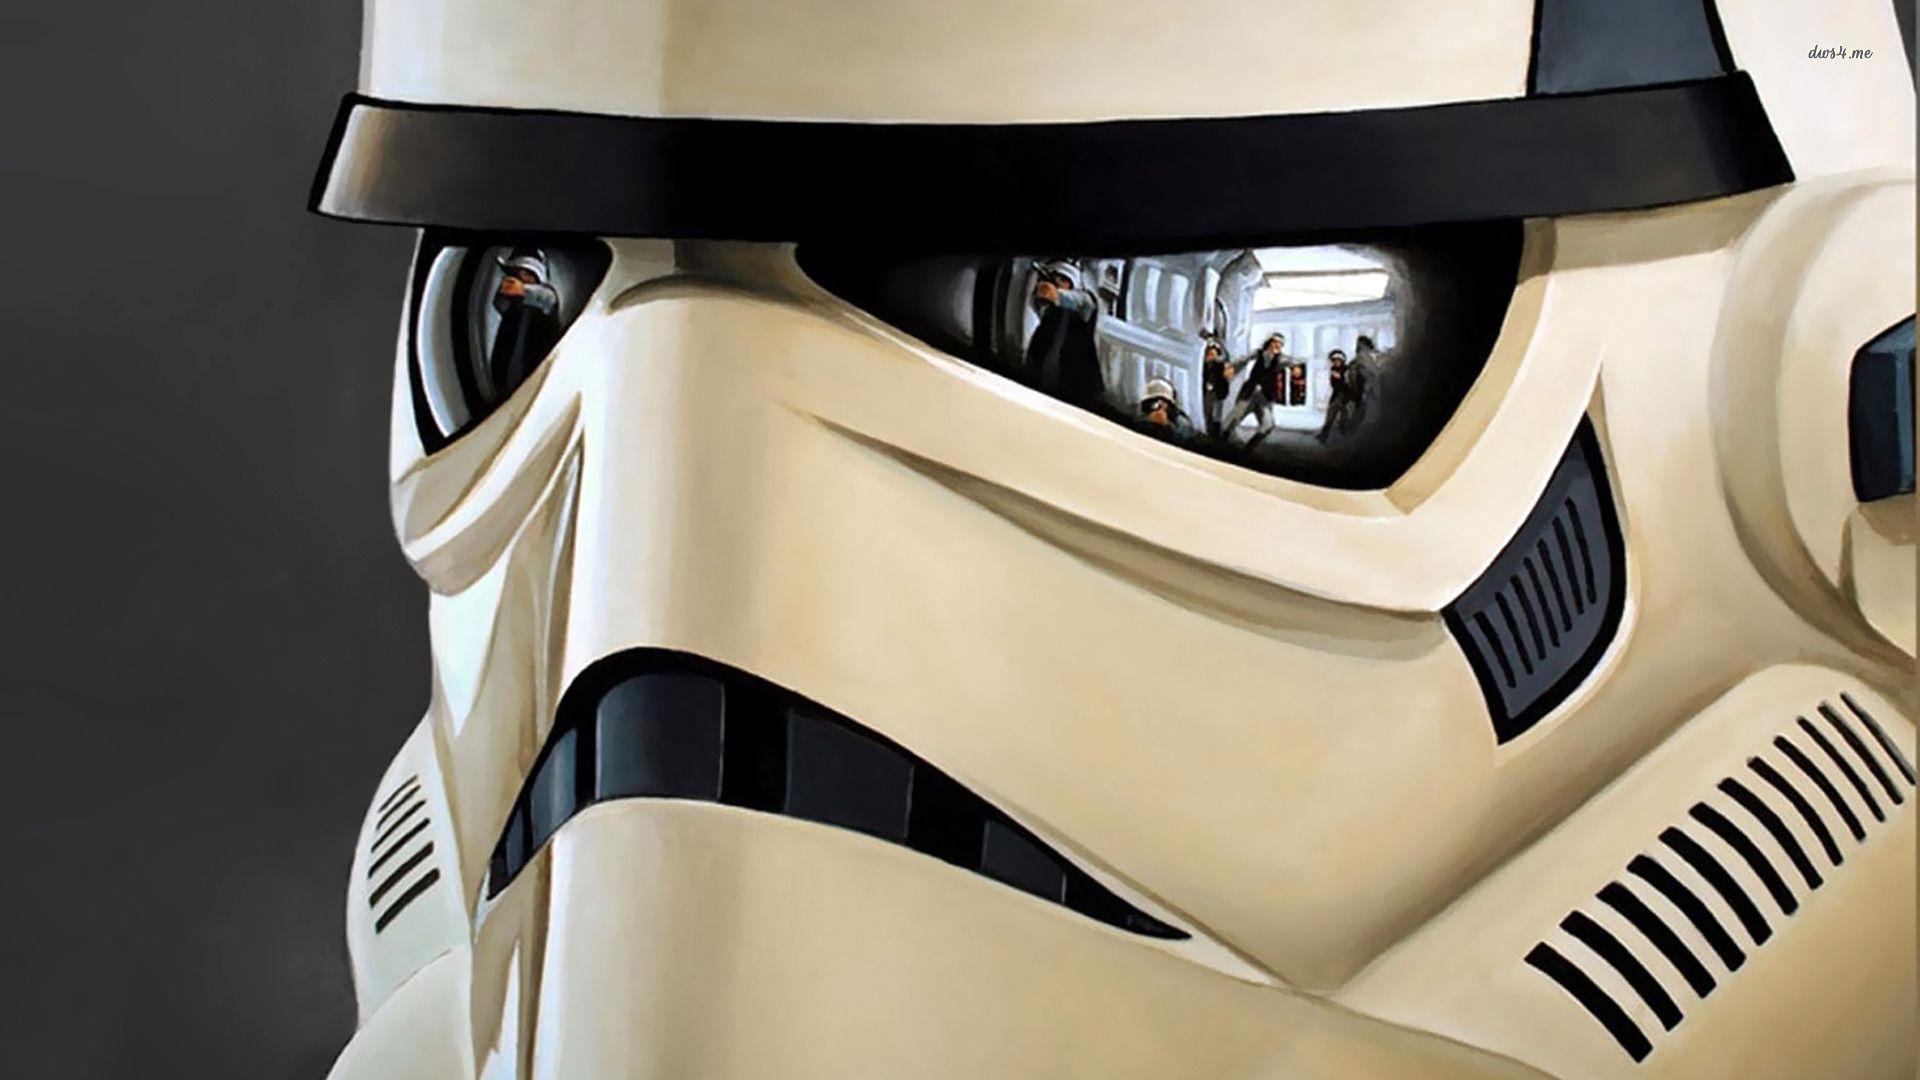 Stormtrooper Wallpapers - Album on Imgur